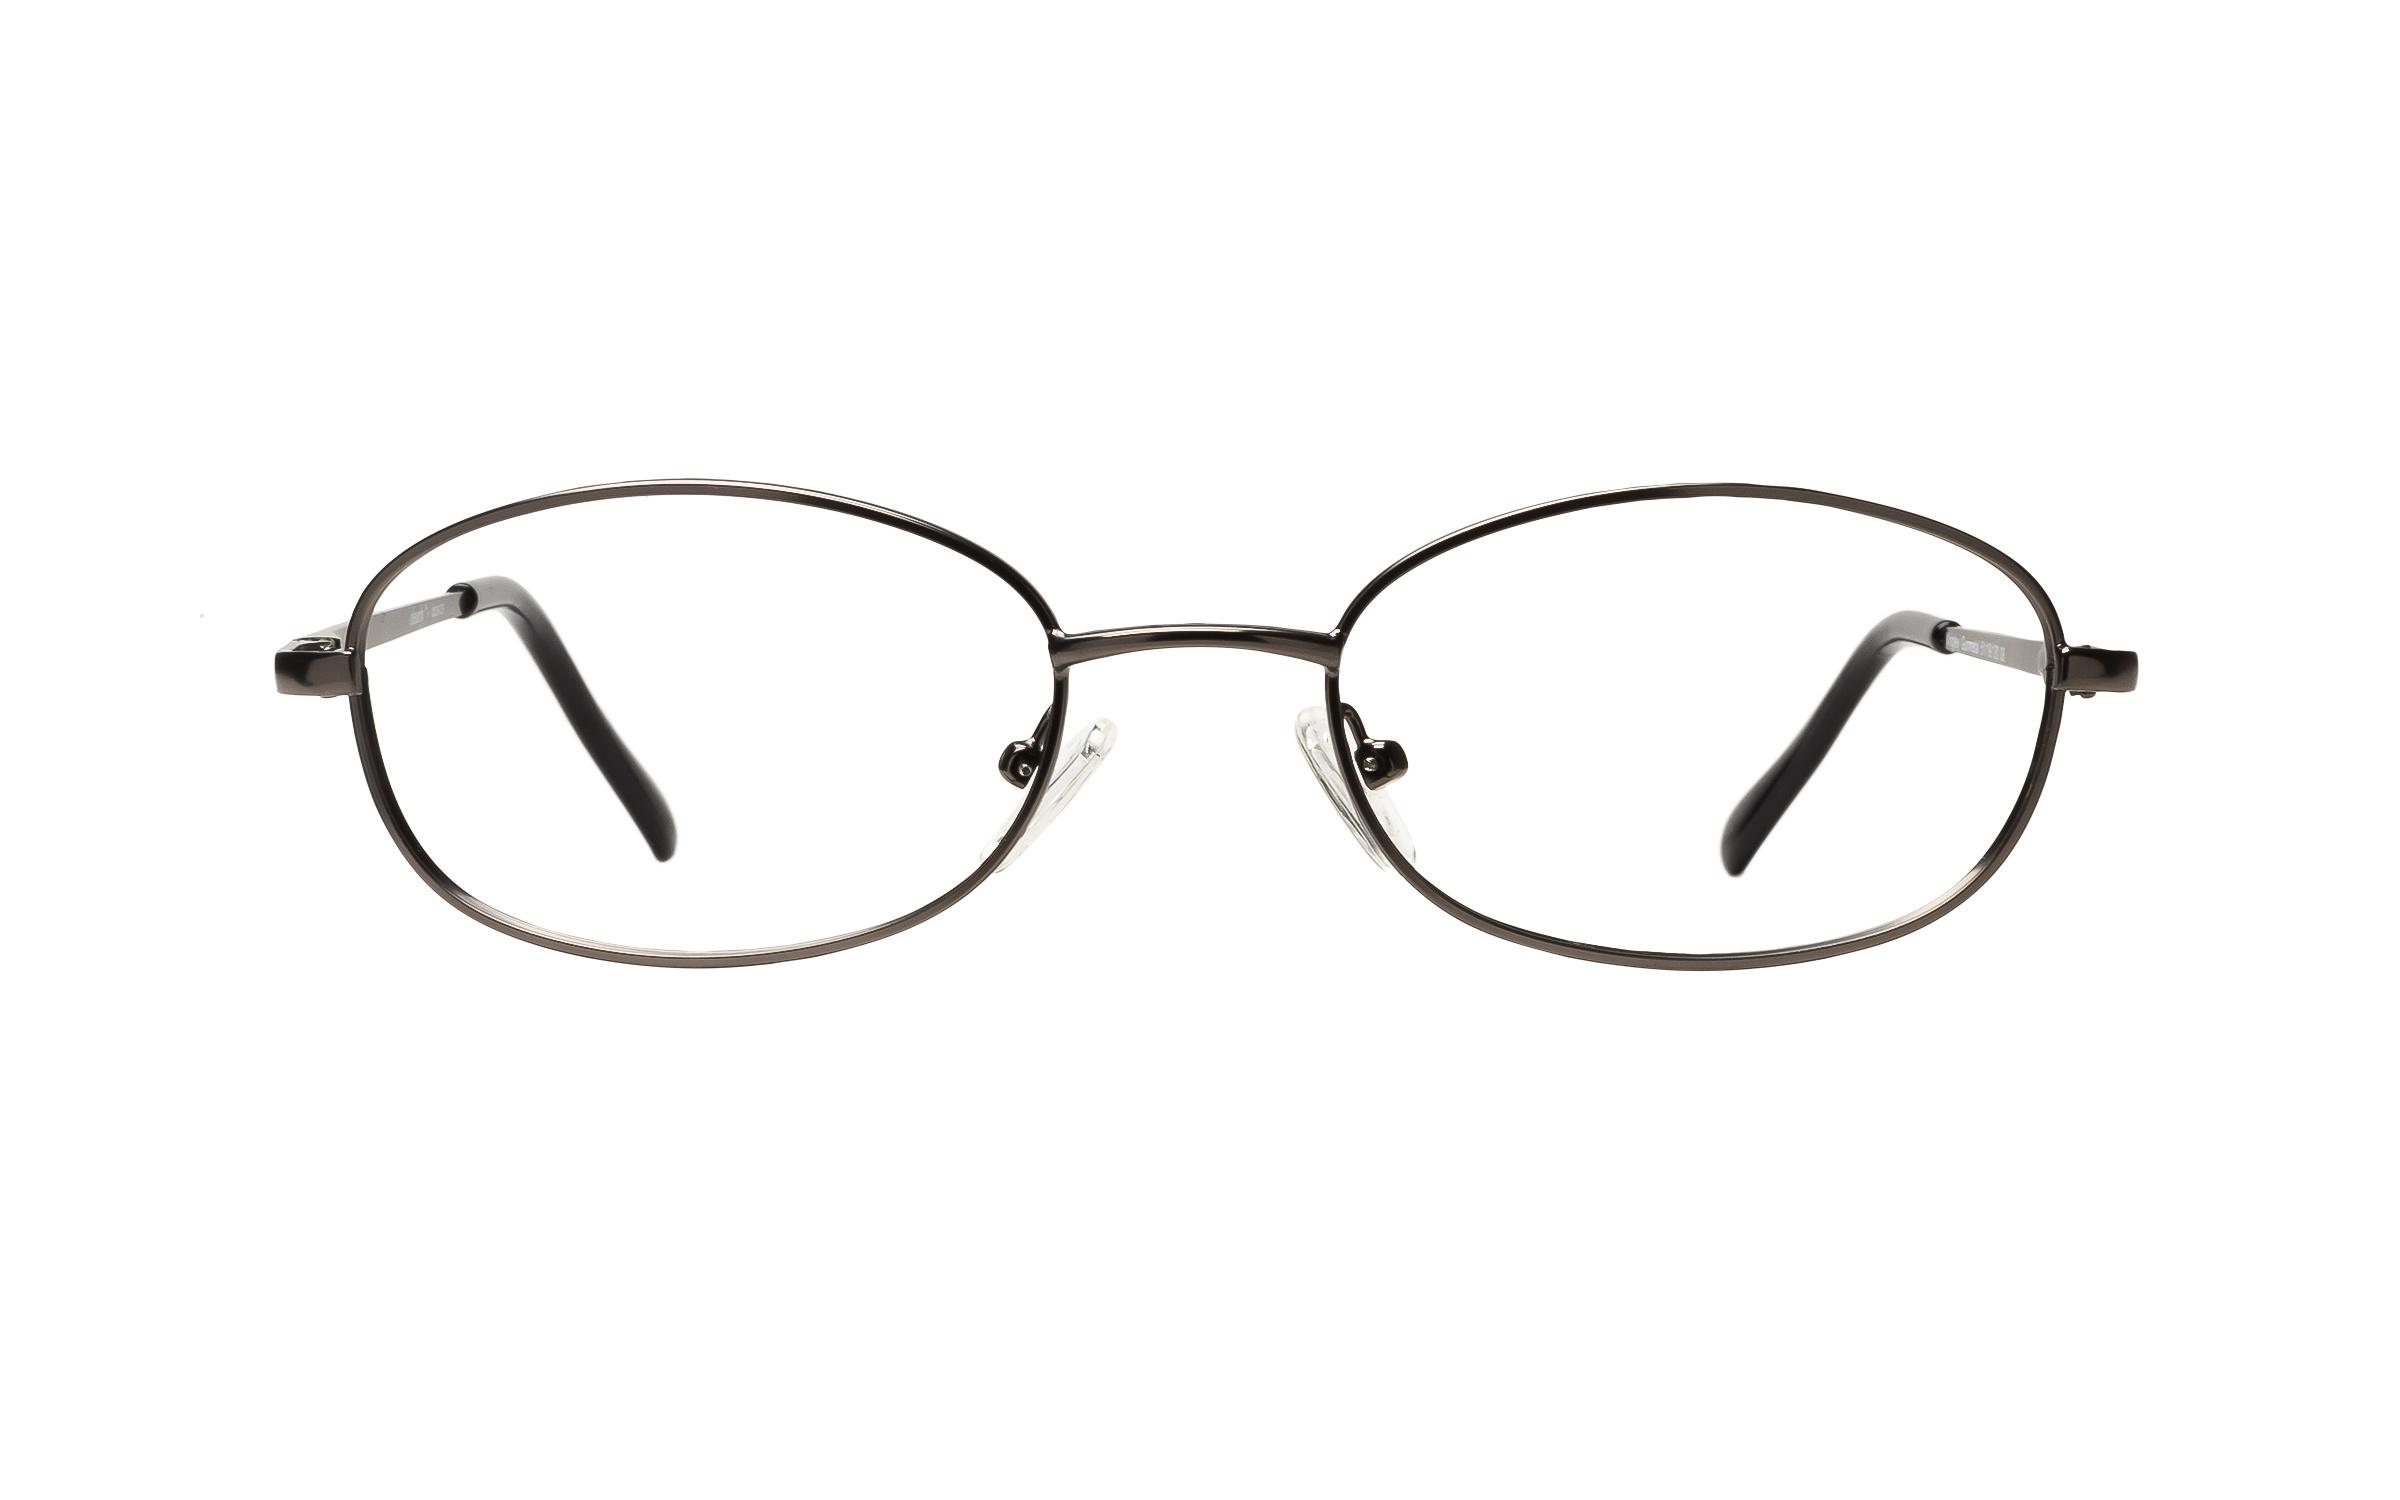 Clearly Basics Wrigley (51) Eyeglasses and Frame in Gunmetal Grey | Plastic - Online Coastal